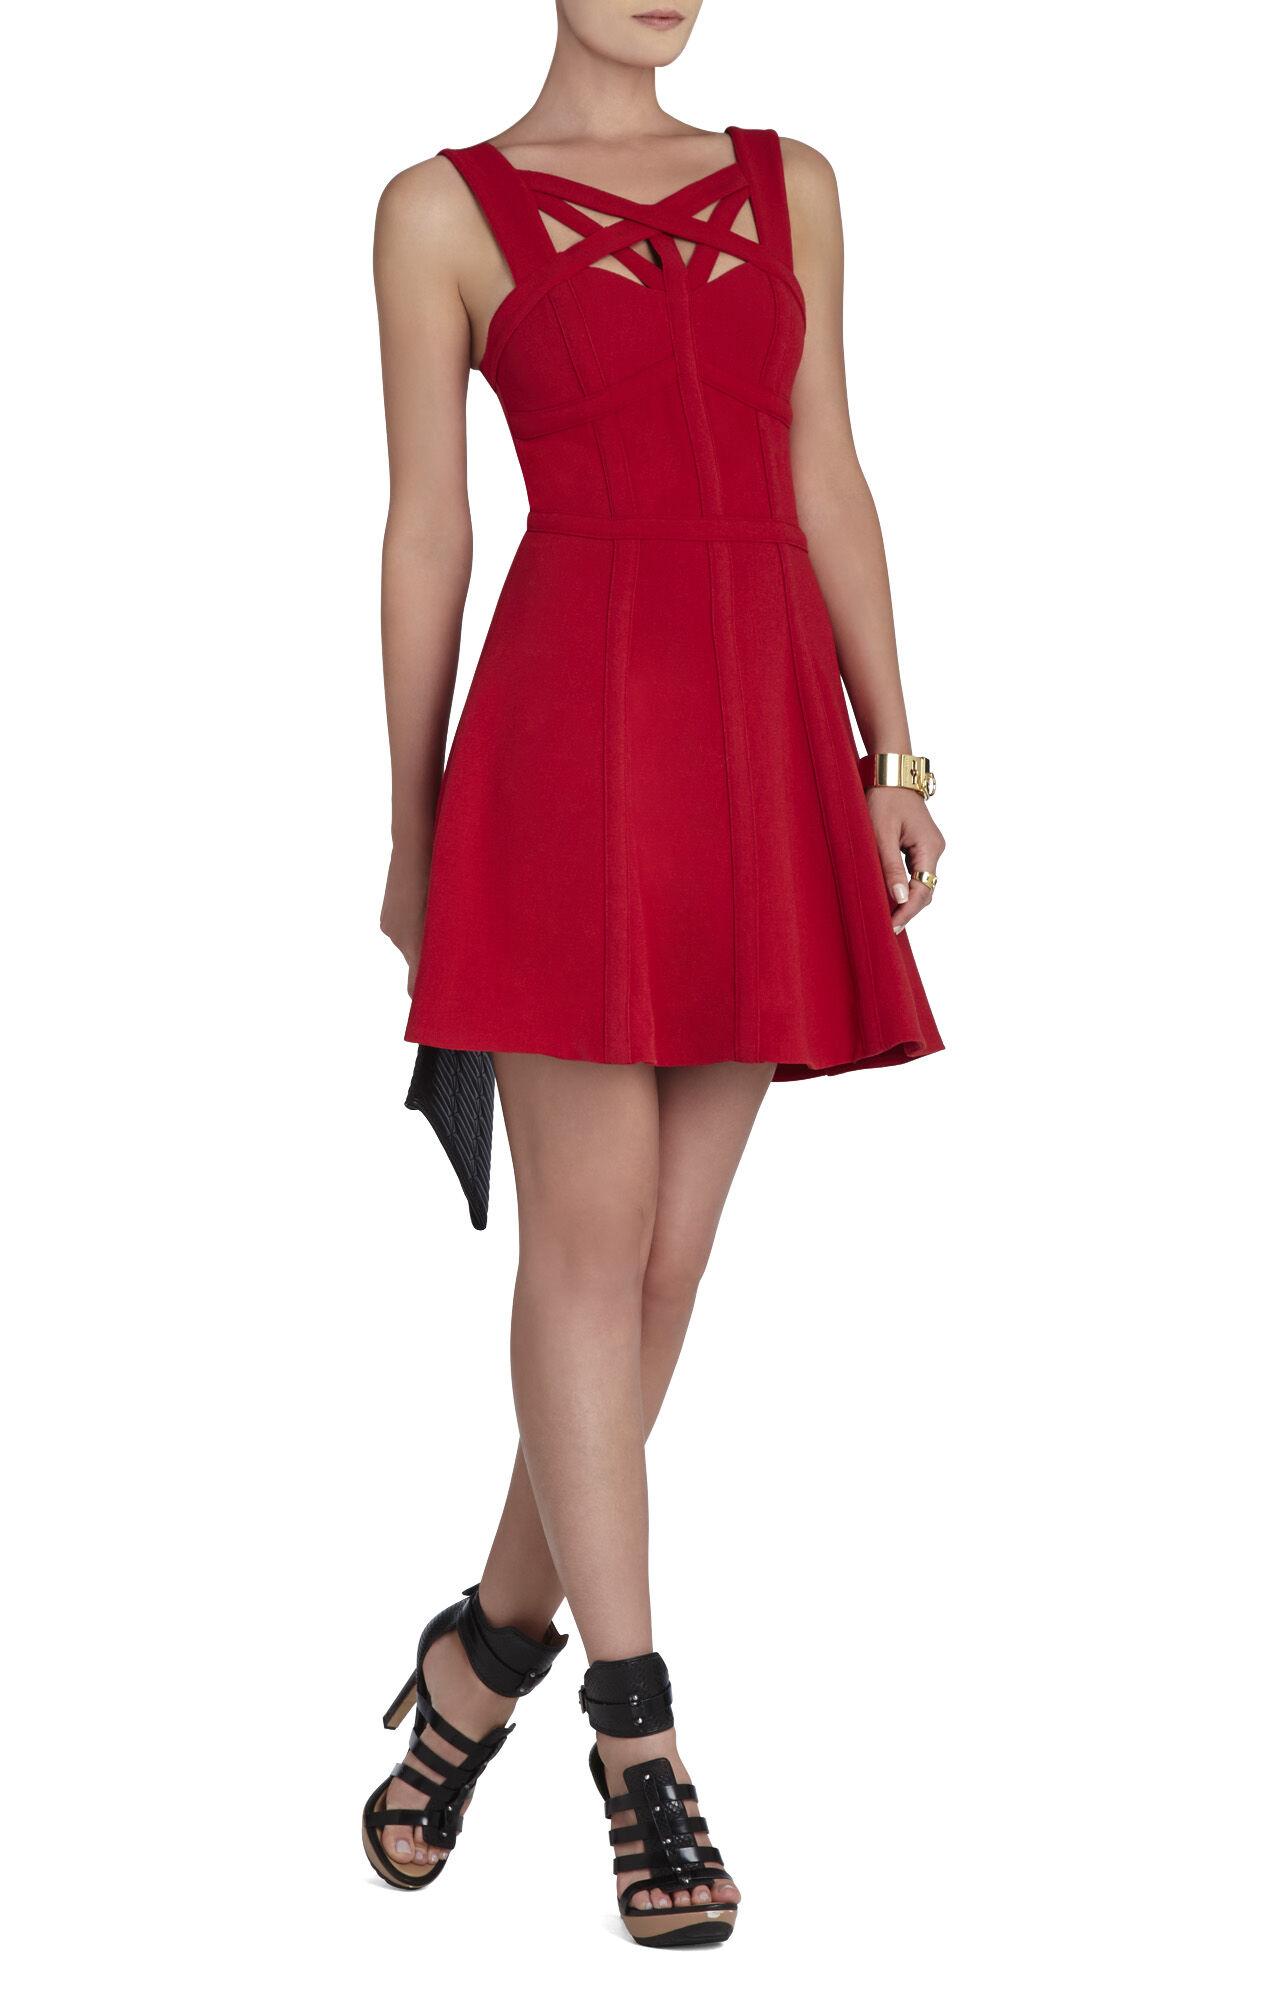 Yasminka Corset A-Line Dress